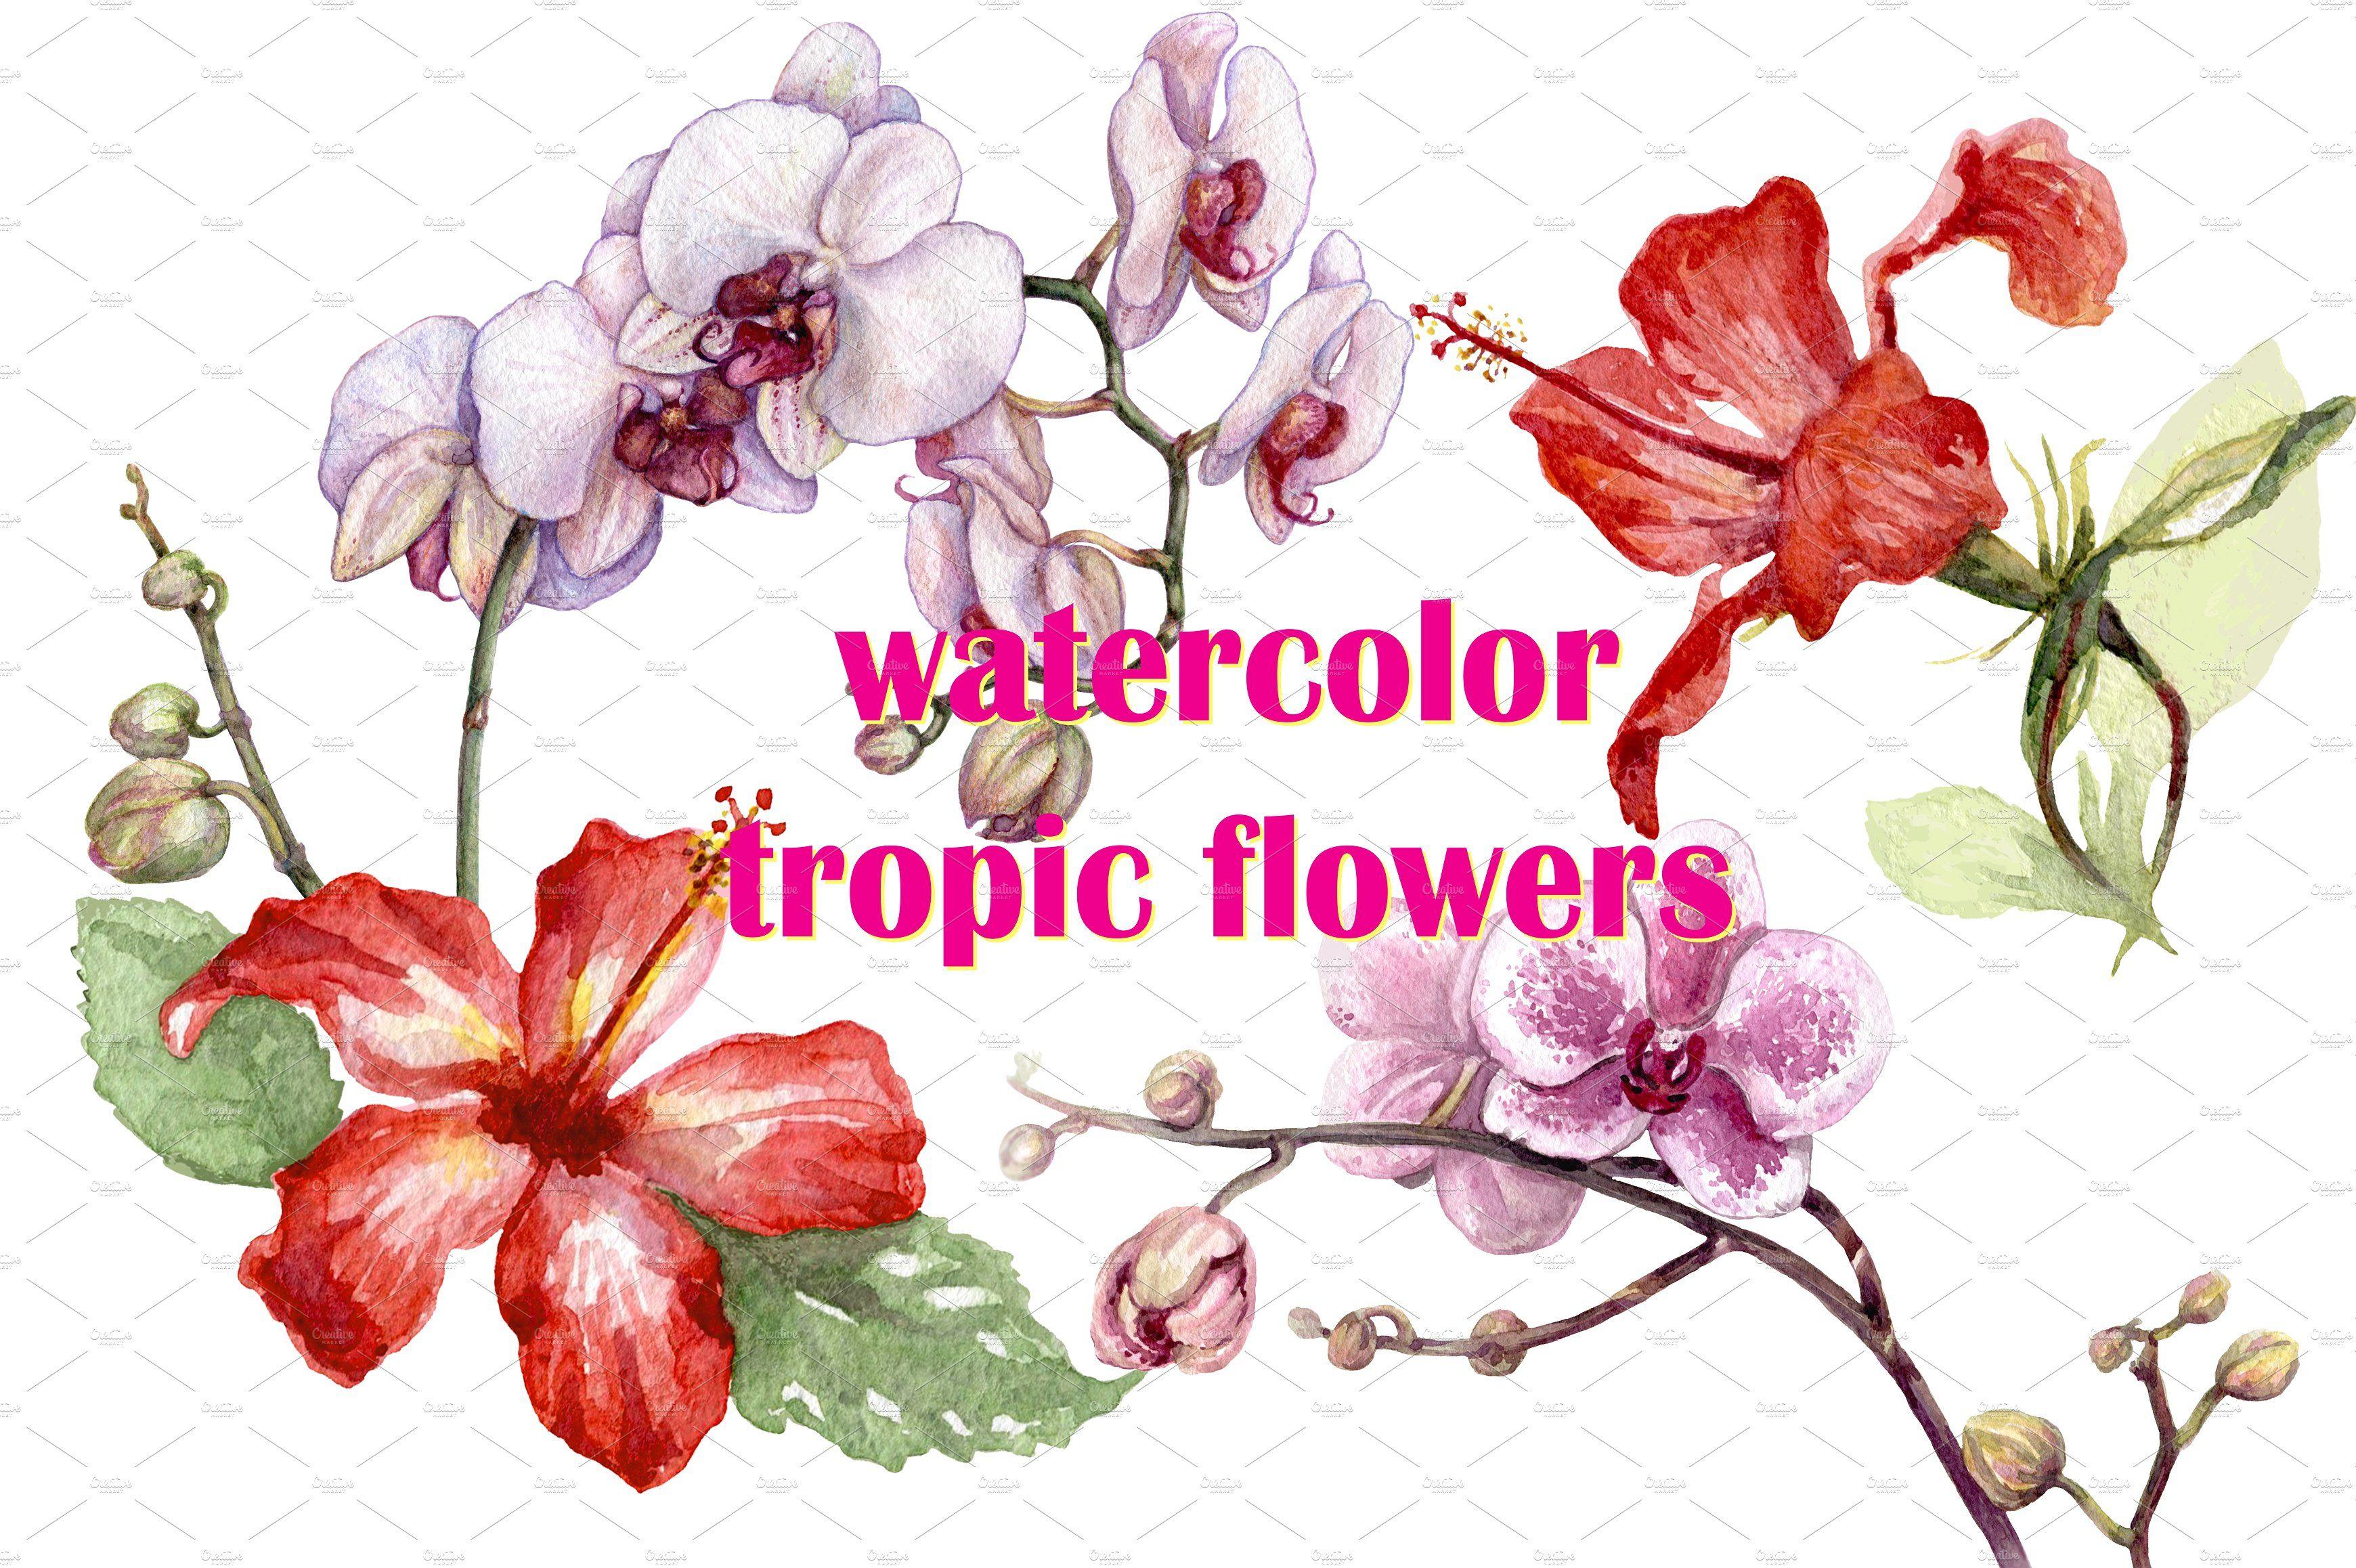 Watercolor tropical plants by valentyna smordova on creativemarket